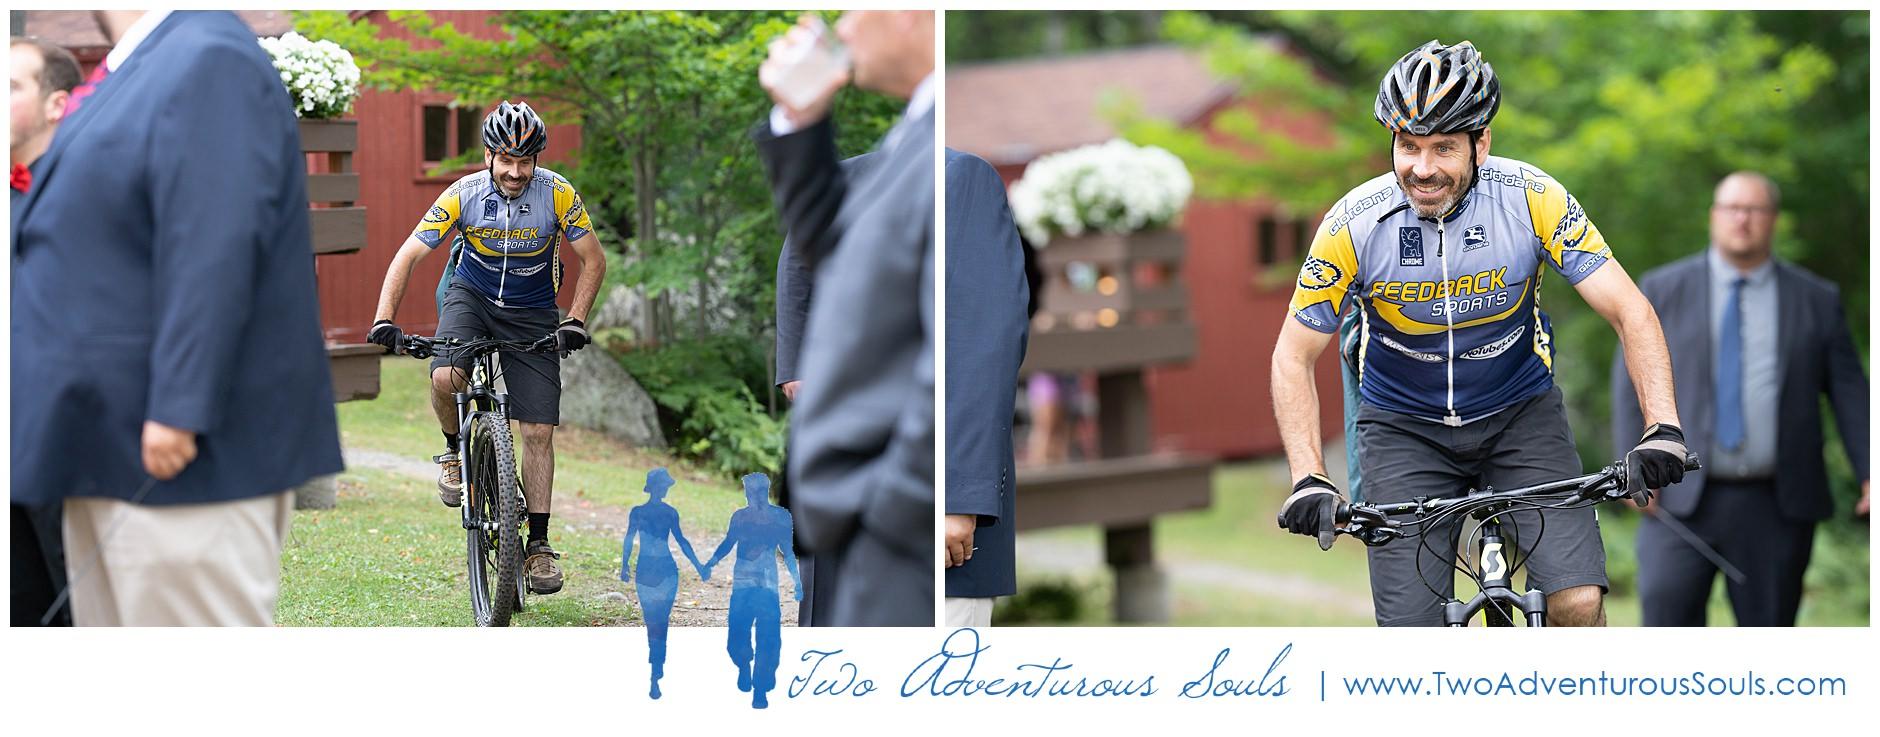 Sugarloaf Outdoor Center Wedding Photographers, Destination Wedding Photographers, Two Adventurous Souls-081719_0032.jpg